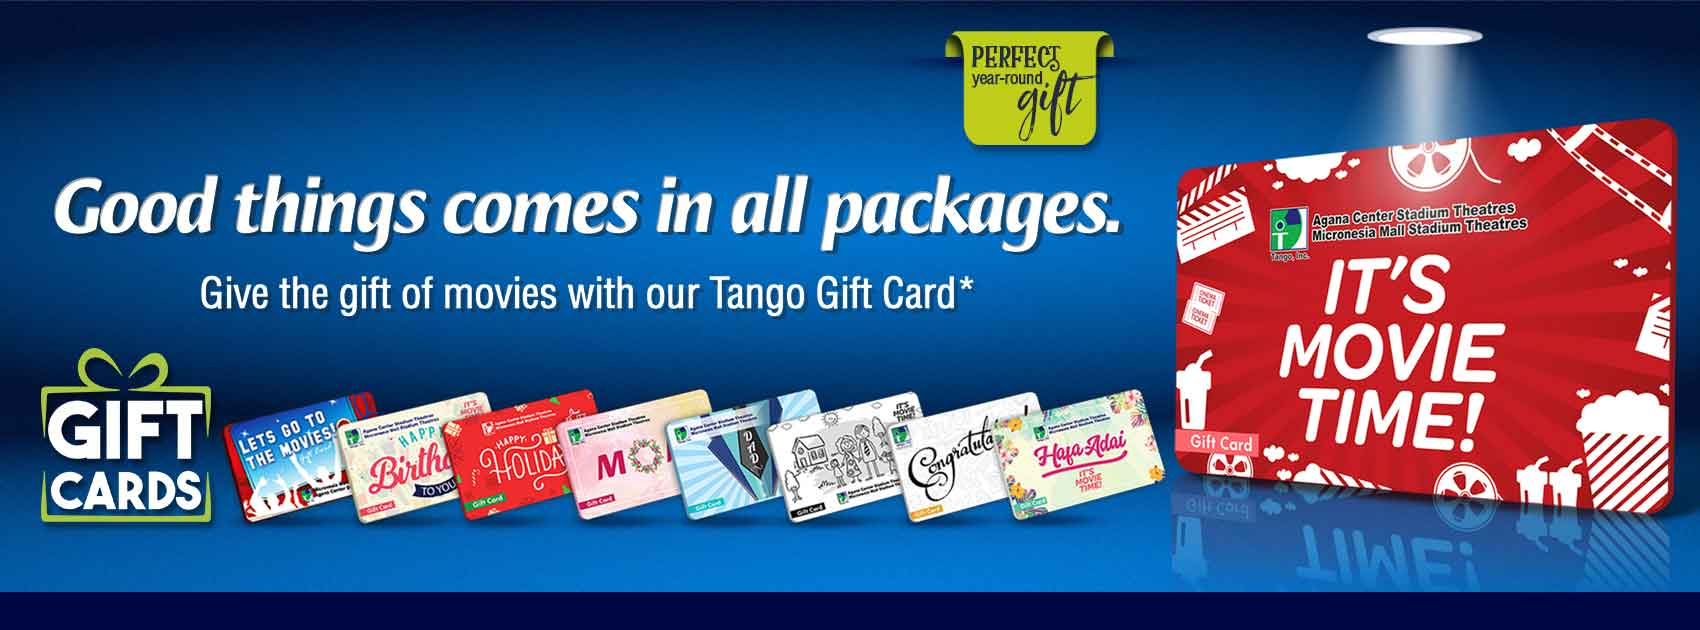 Gift Card Web Banner